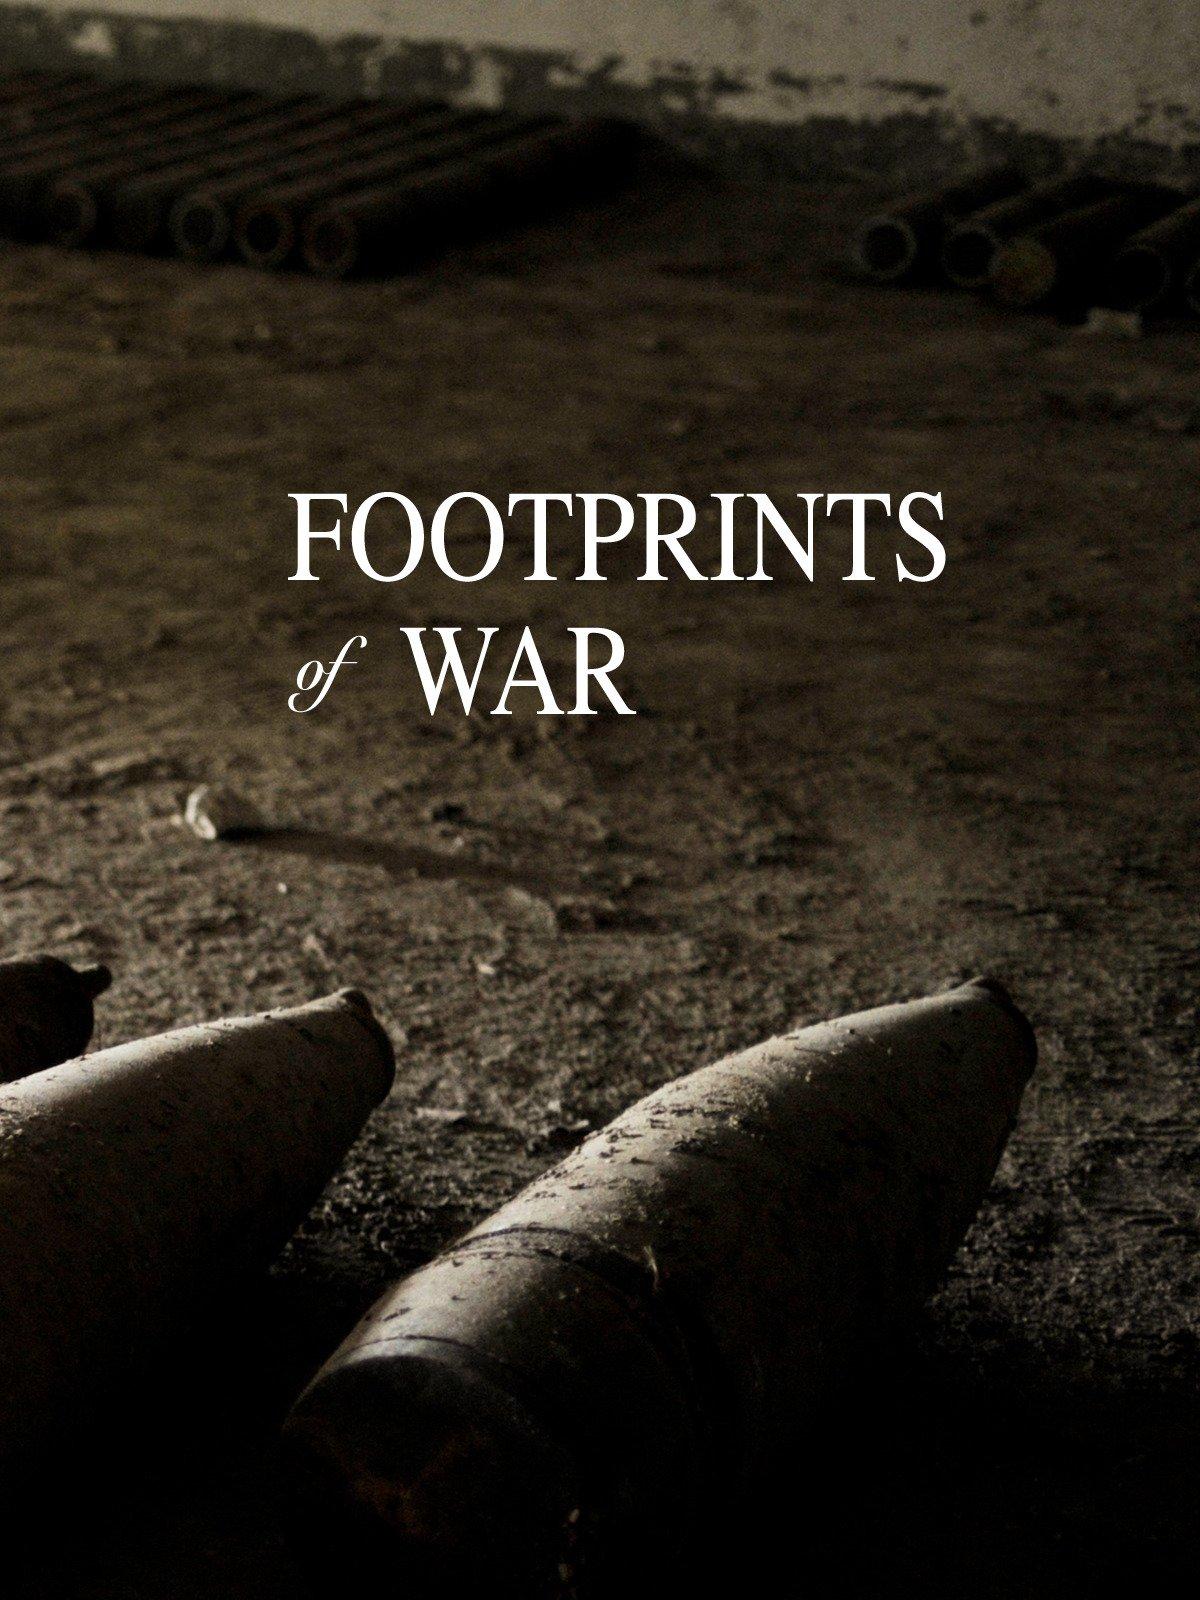 Footprints Of War